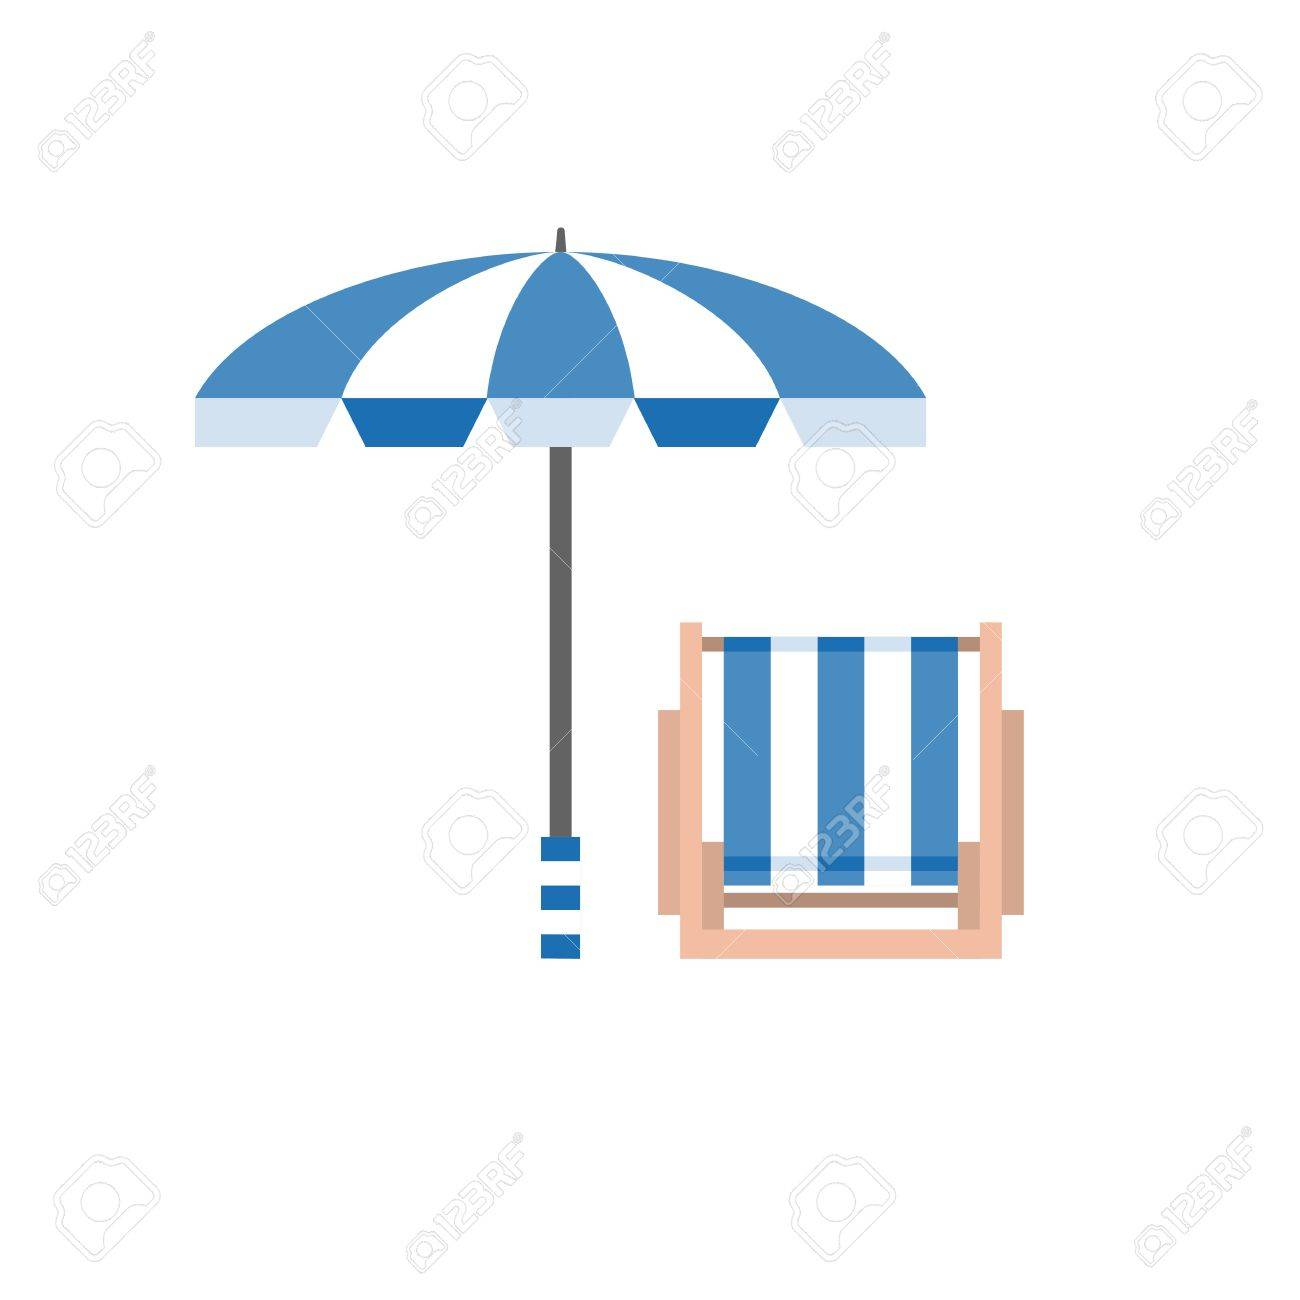 Beach umbrella and chair - Umbrella And Chair Vector Illustration Beach Bed And Beach Umbrella Icon Holiday Symbol